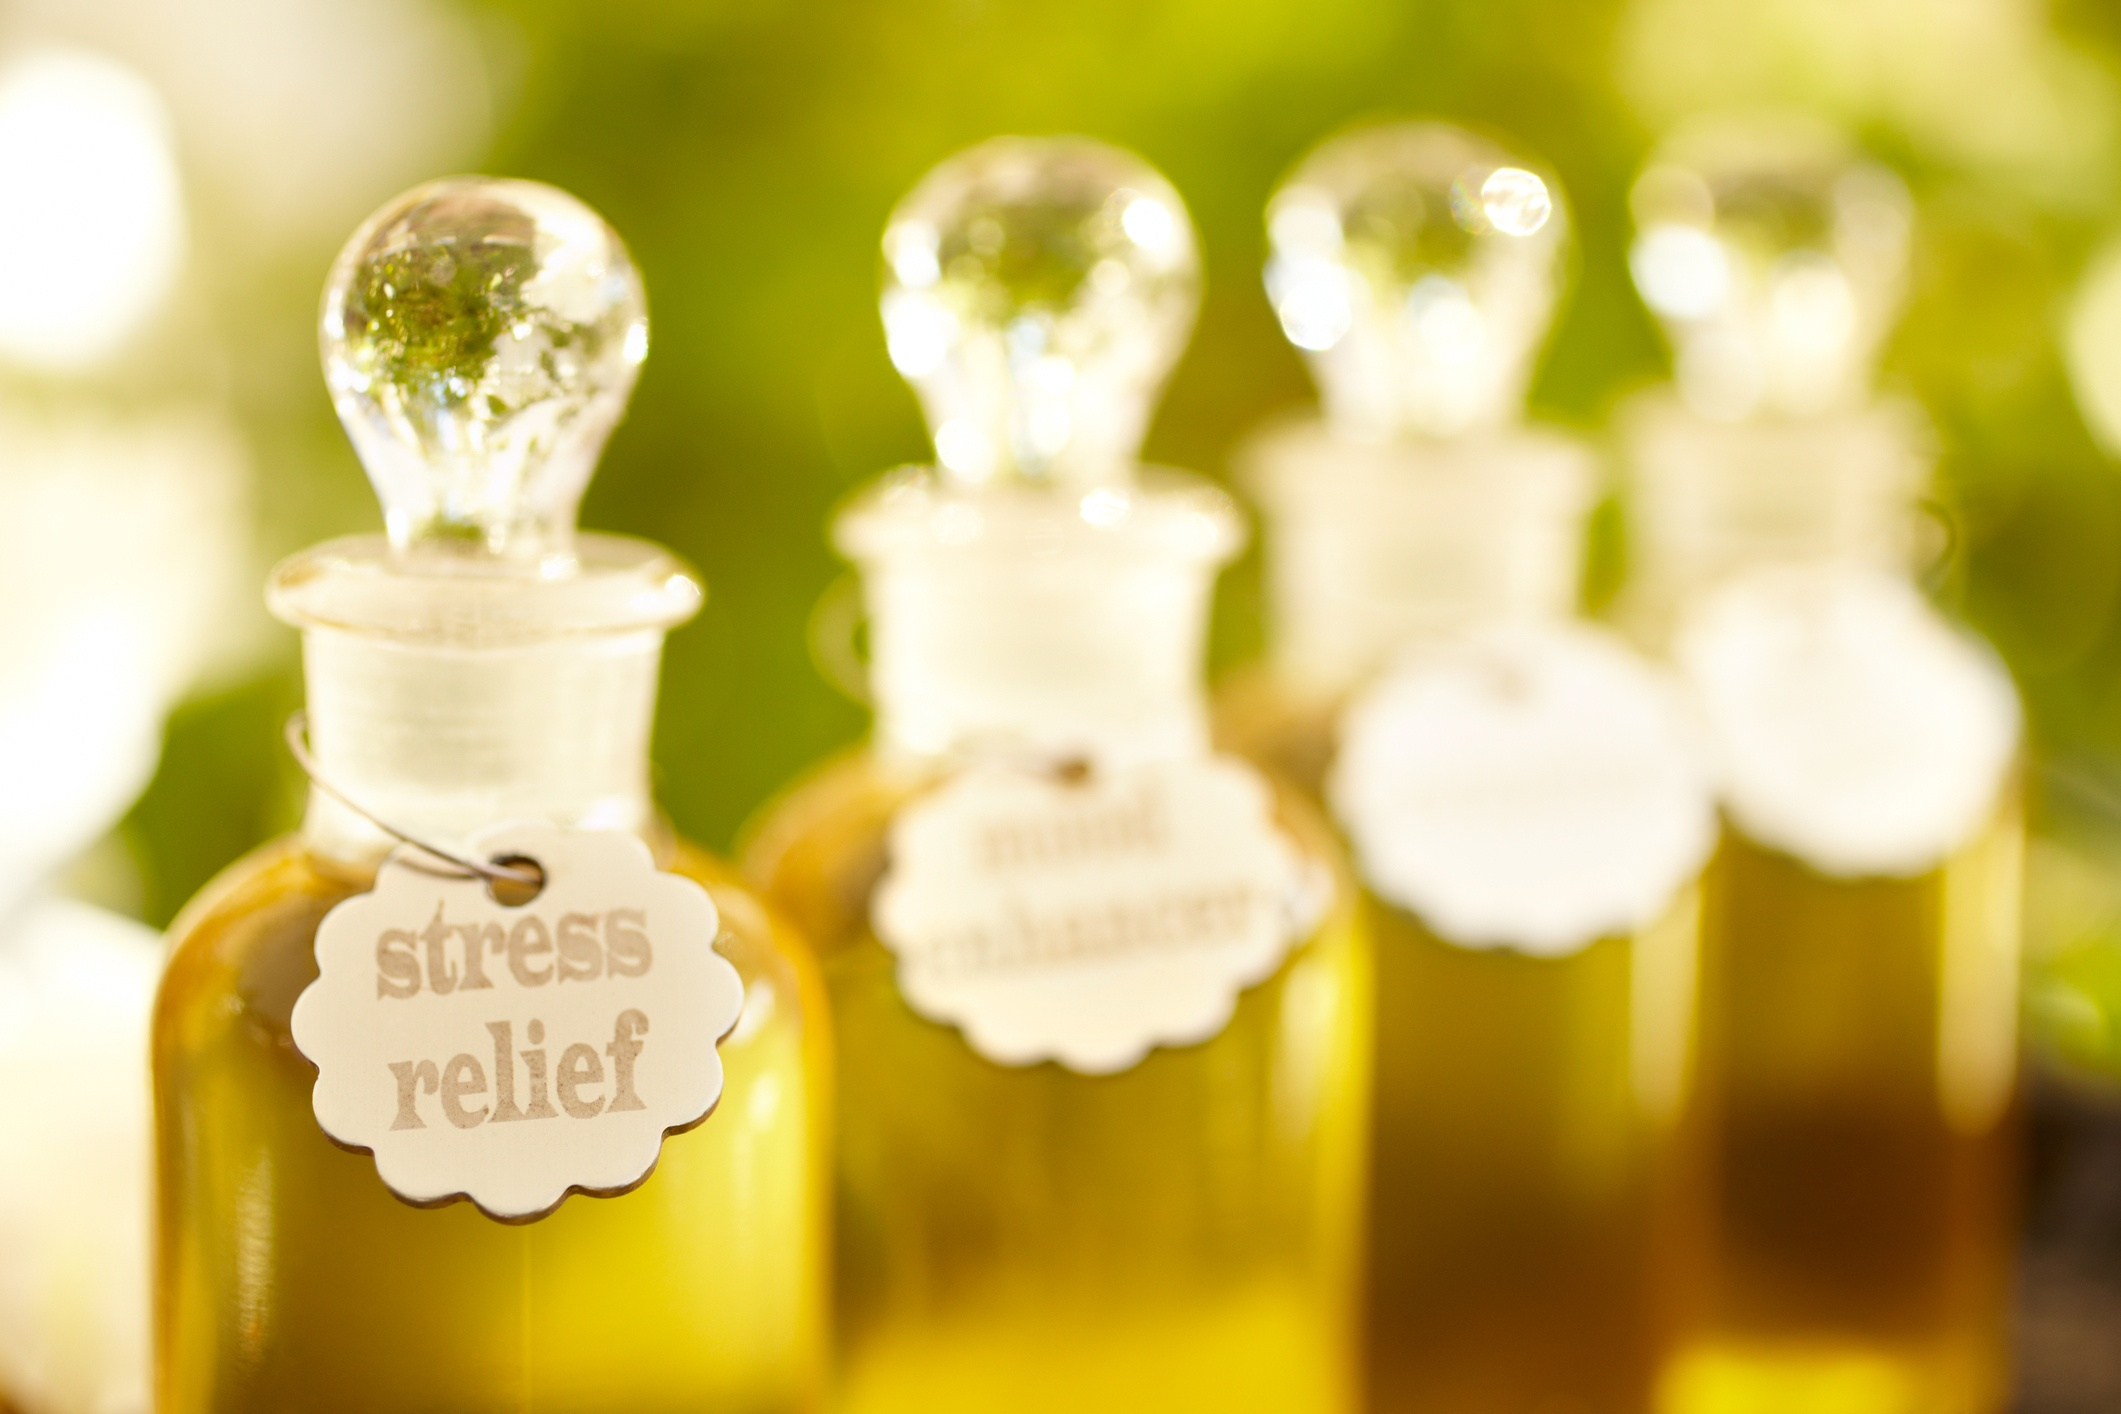 Massage-oil-bottles-at-spa-154904937_2122x1415.jpeg